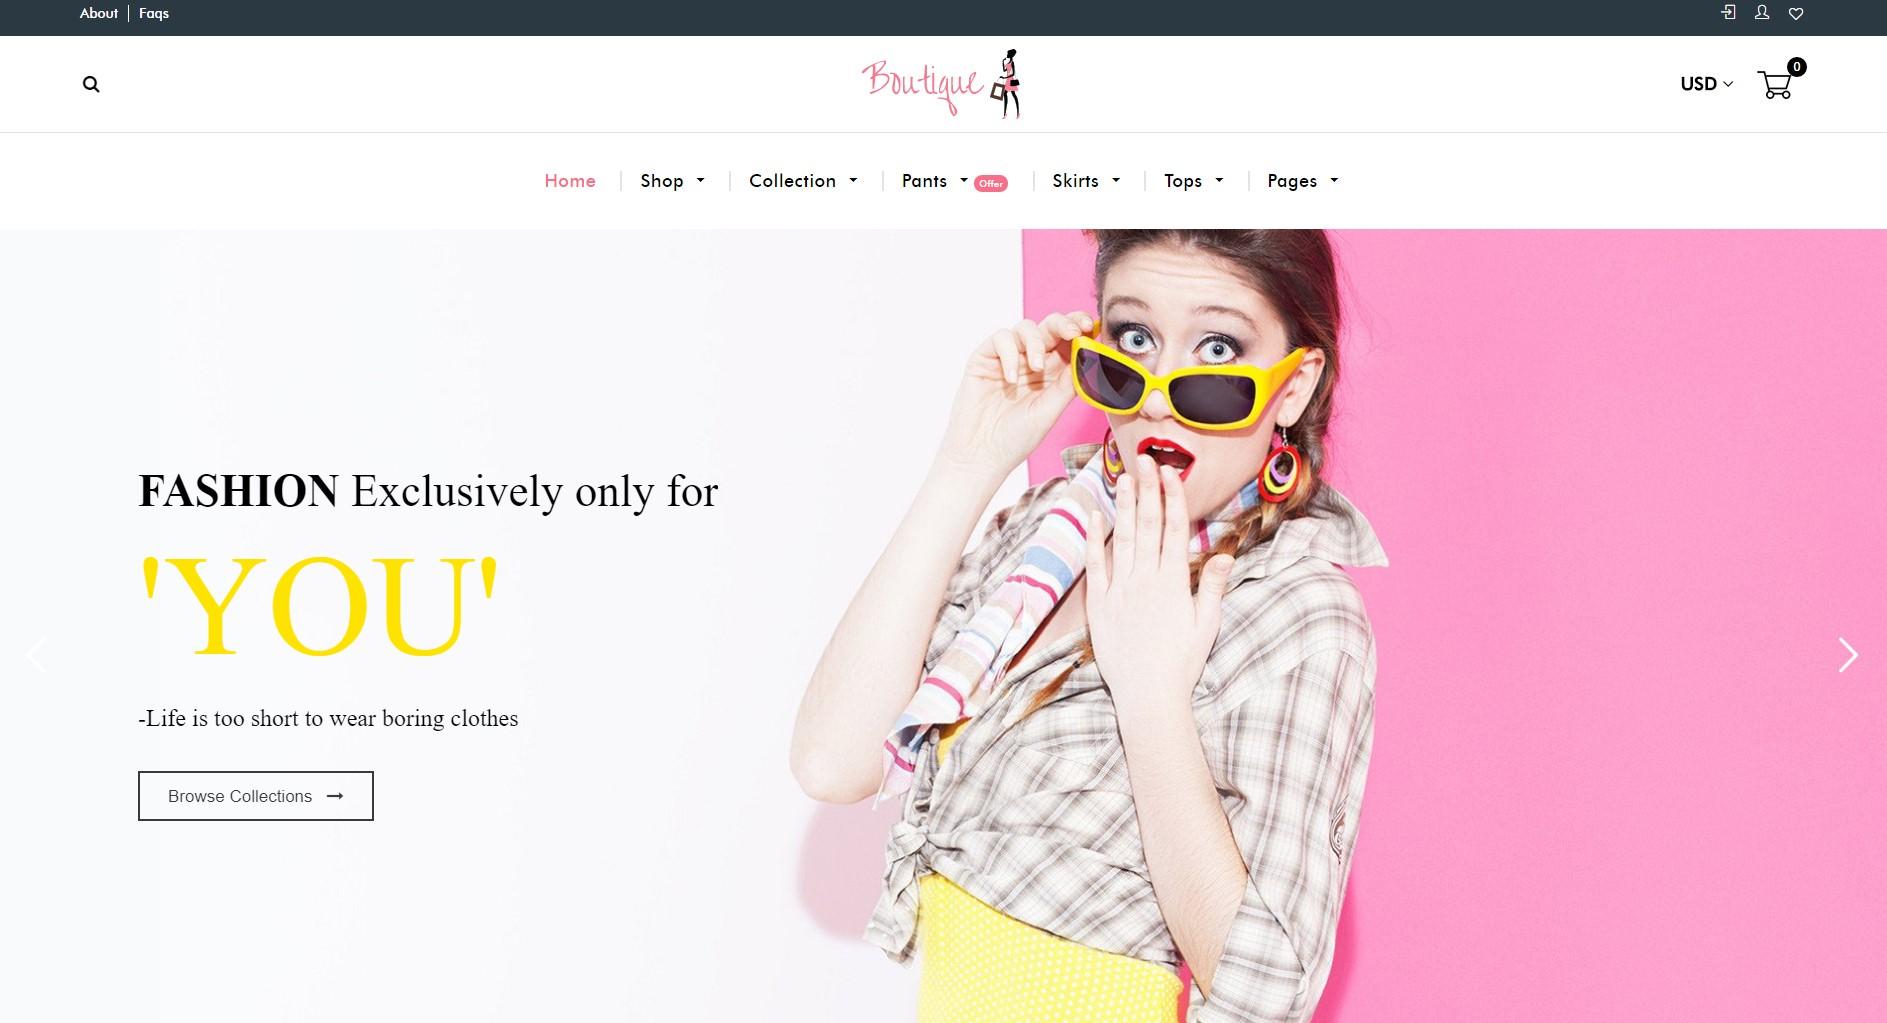 Fashion Boutique theme